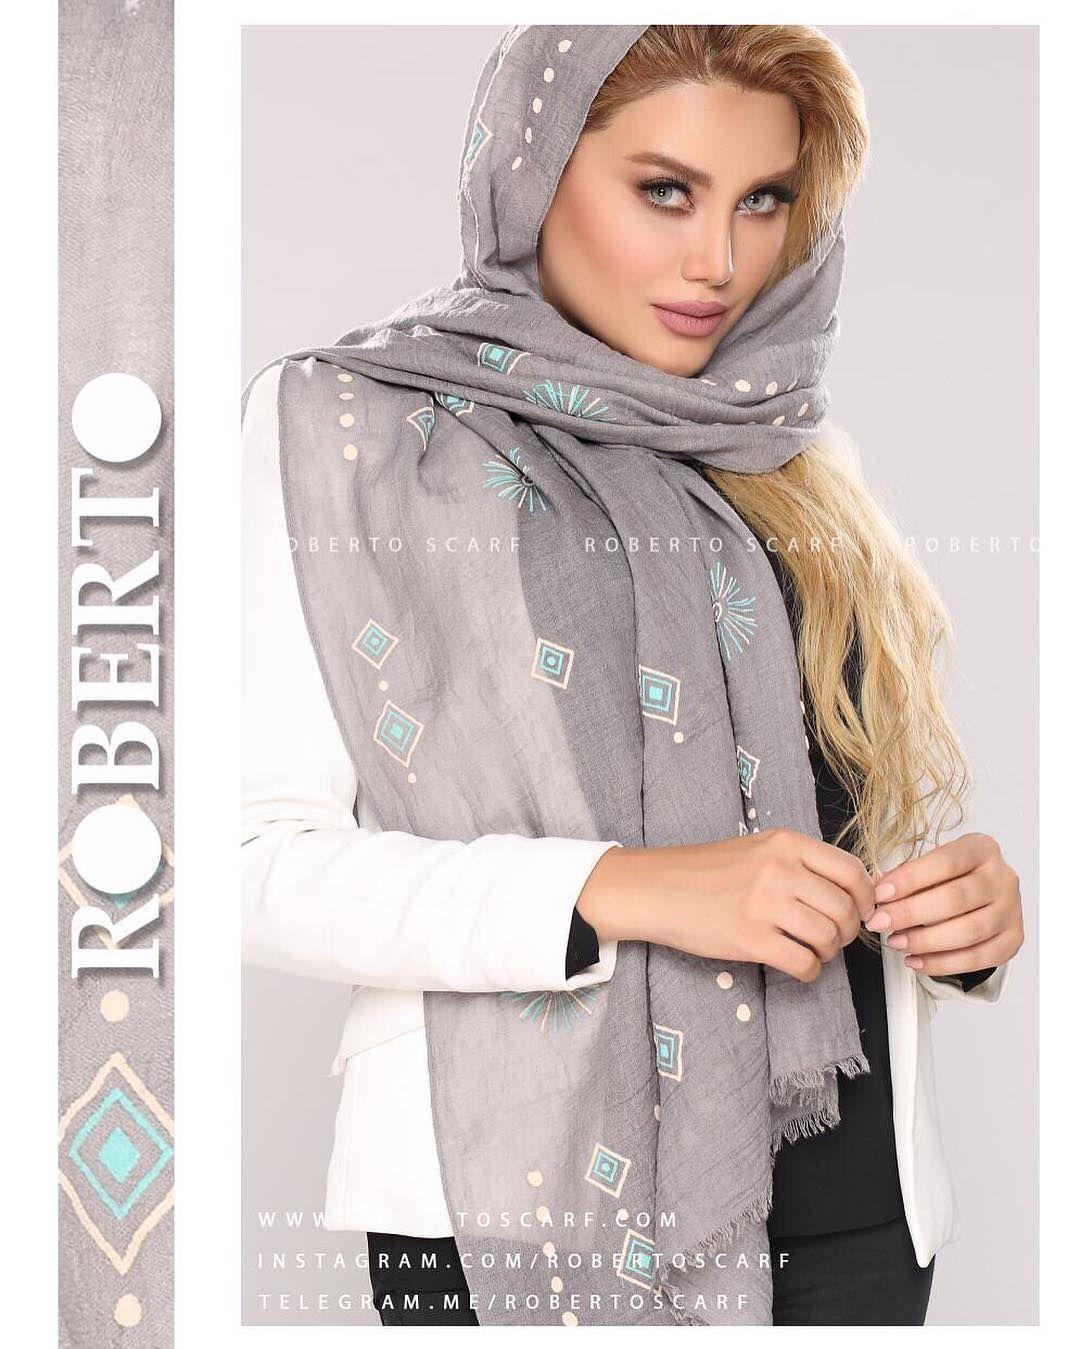 #روسرى#شال#لاكچرى #فشن #دخترانه#پوشاك زنانه#بوتيك#scarf #robertoscarf #scarves